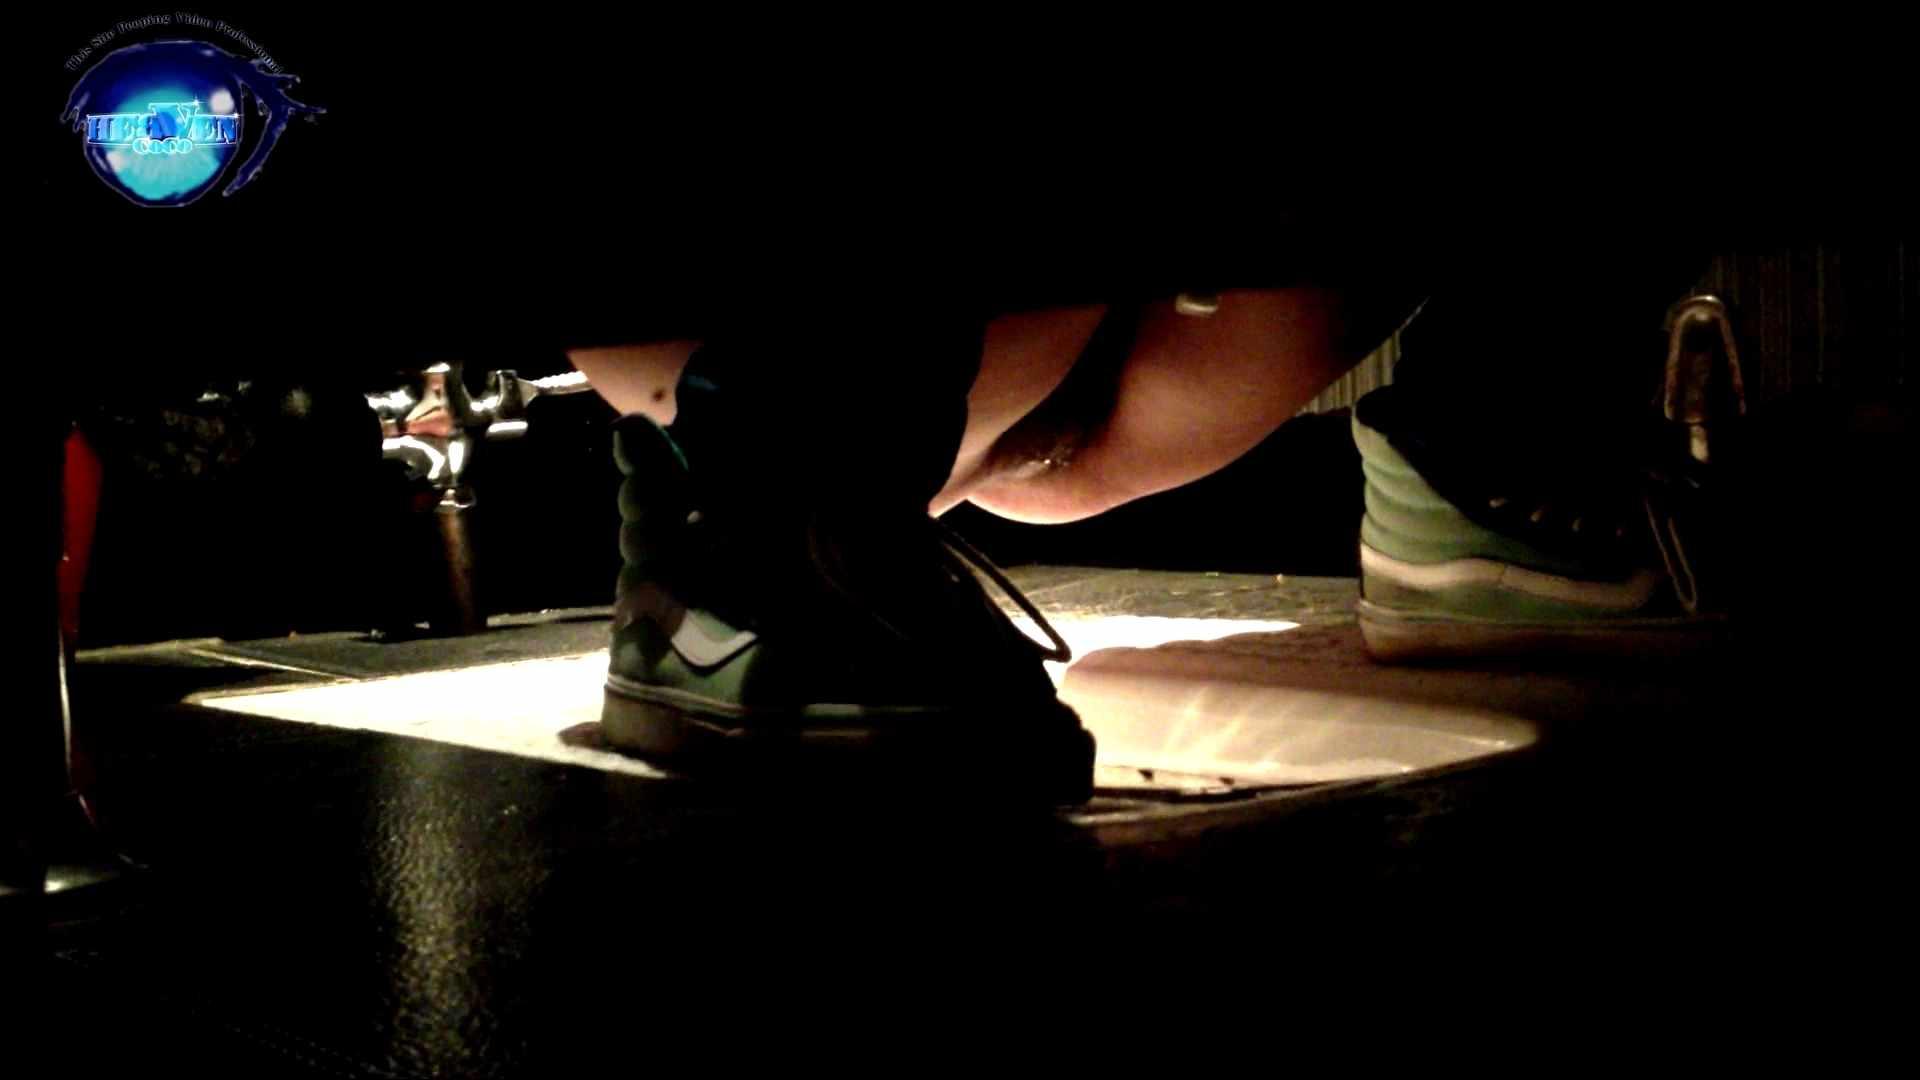 GOD HAND ファッションショッピングセンター盗撮vol.06 高画質 ワレメ動画紹介 51連発 41